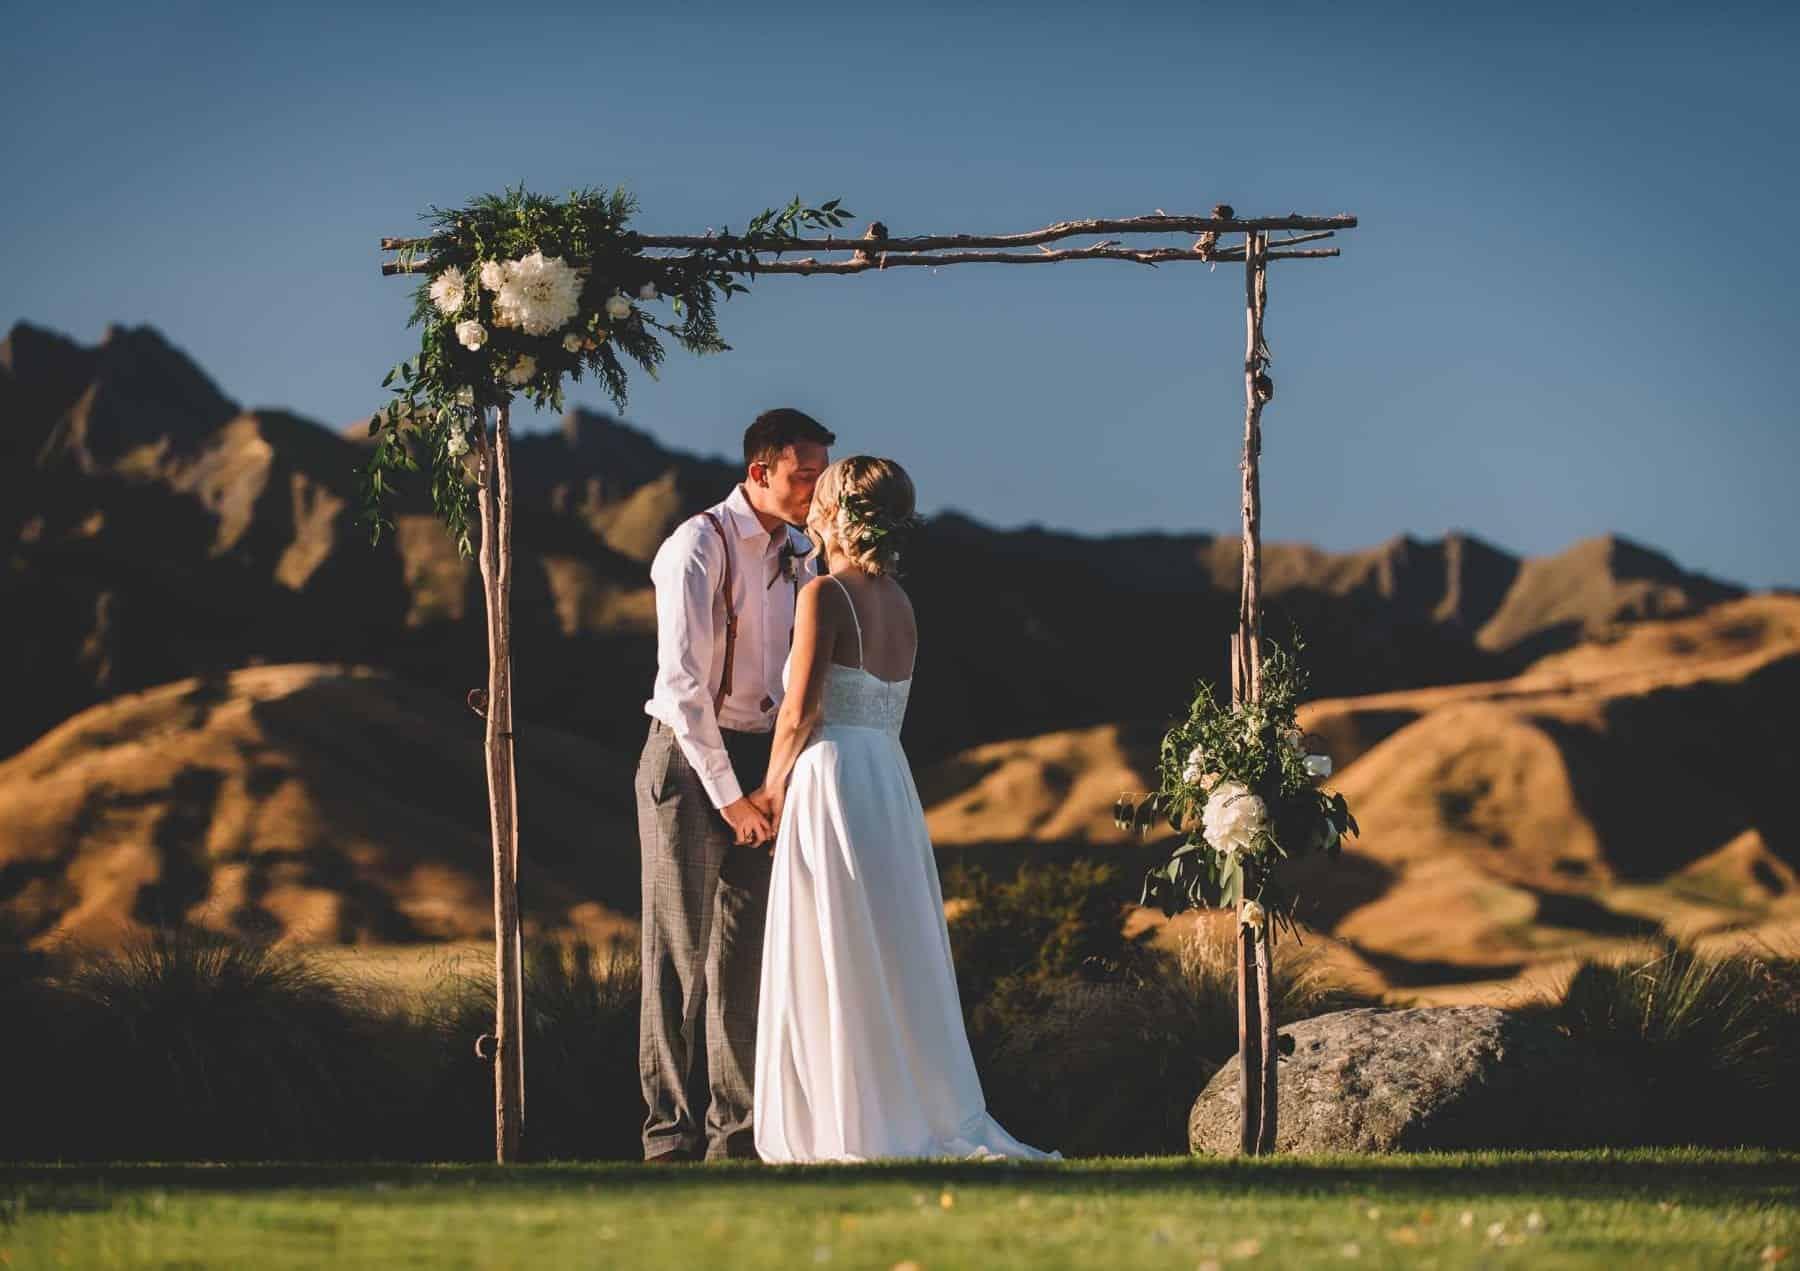 blog post featured image lookout lodge wedding venue wanaka wedding